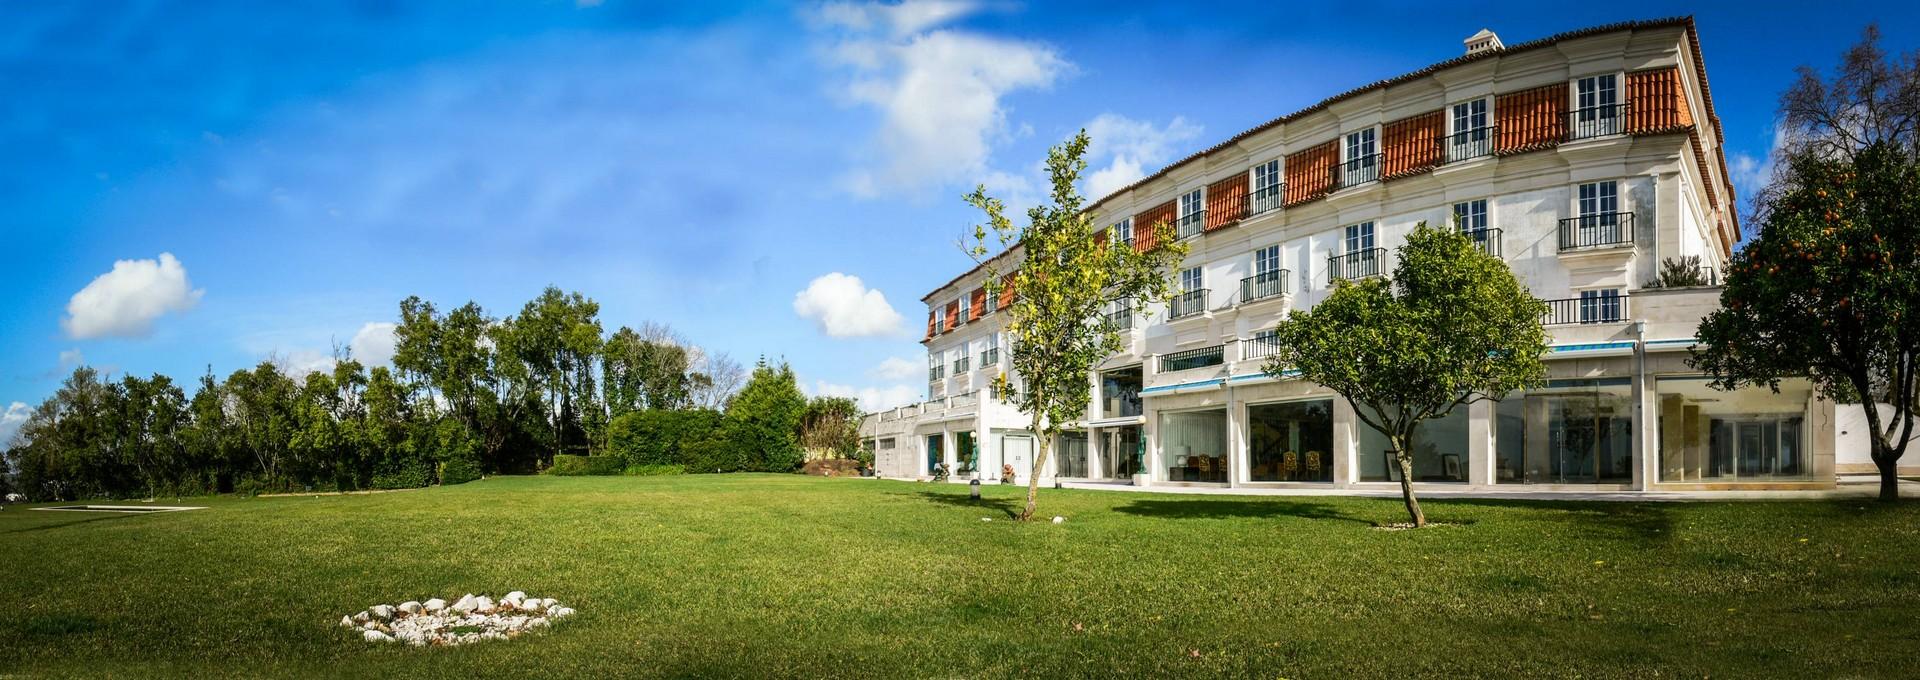 Historic Hotels in Portugal: Condeixa-Coimbra historic hotels in portugal Historic Hotels in Portugal That You Can't Miss Historic Hotels in Portugal 10